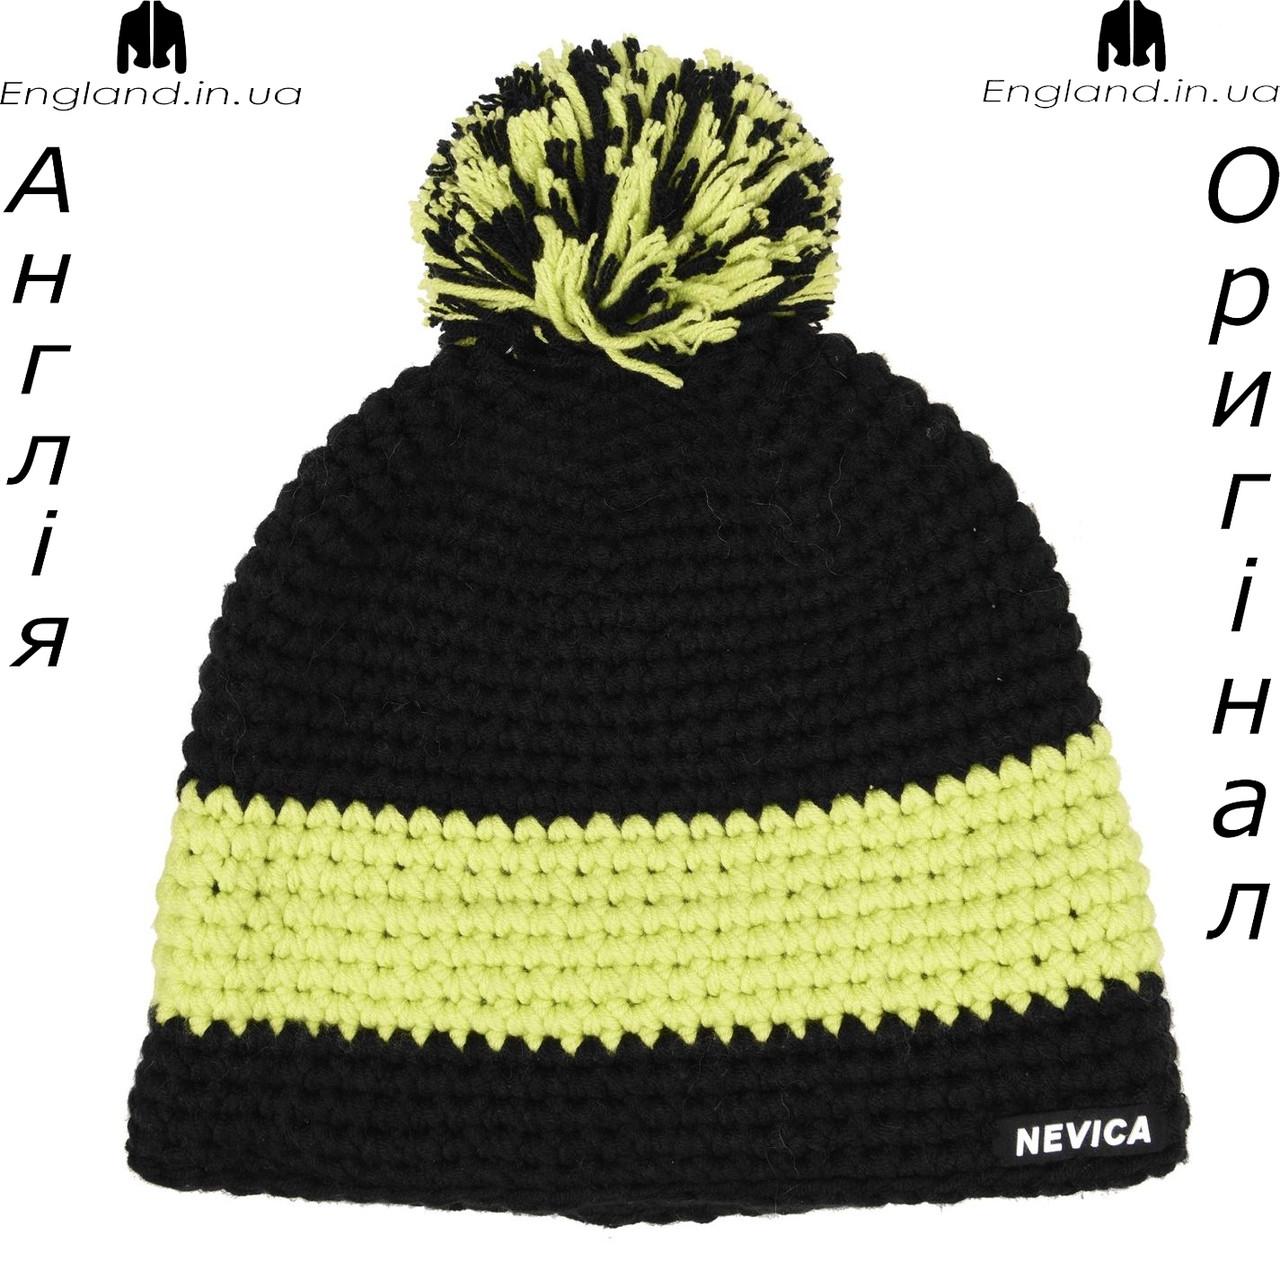 Шапка Nevica из Англии - зима / демисезон